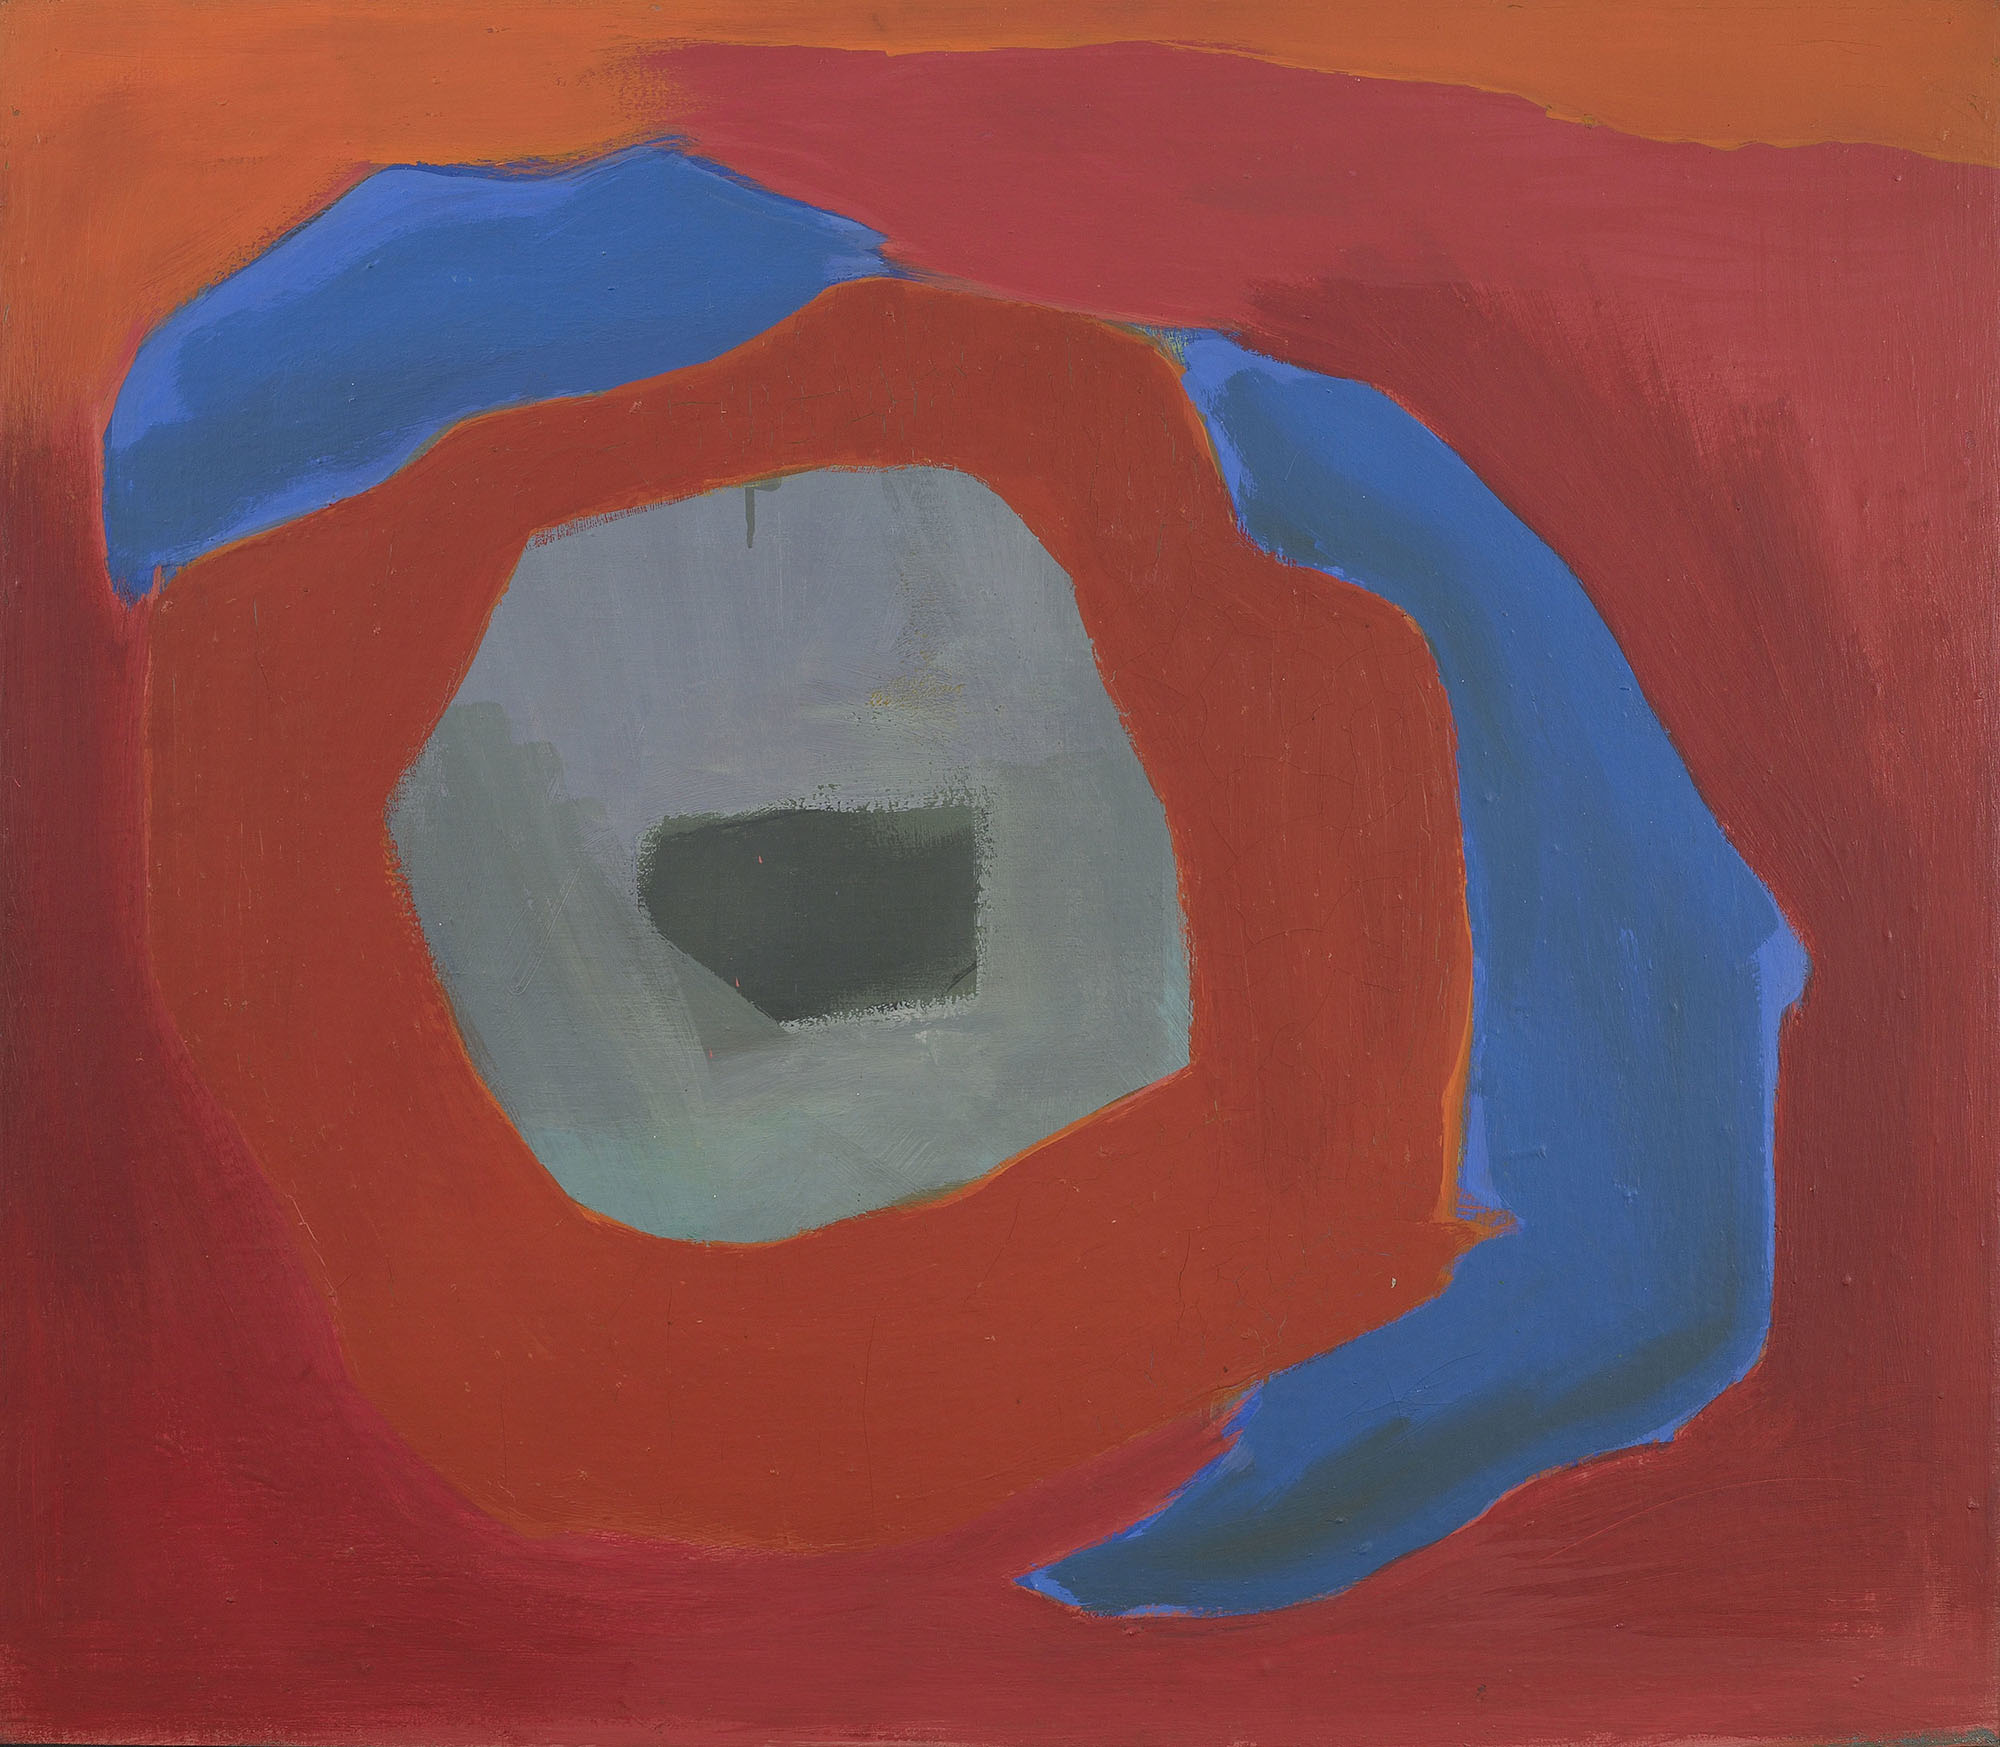 SOLD  Untitled (Bridgehampton)  , 1967, oil on canvas, 28 x 32 inches